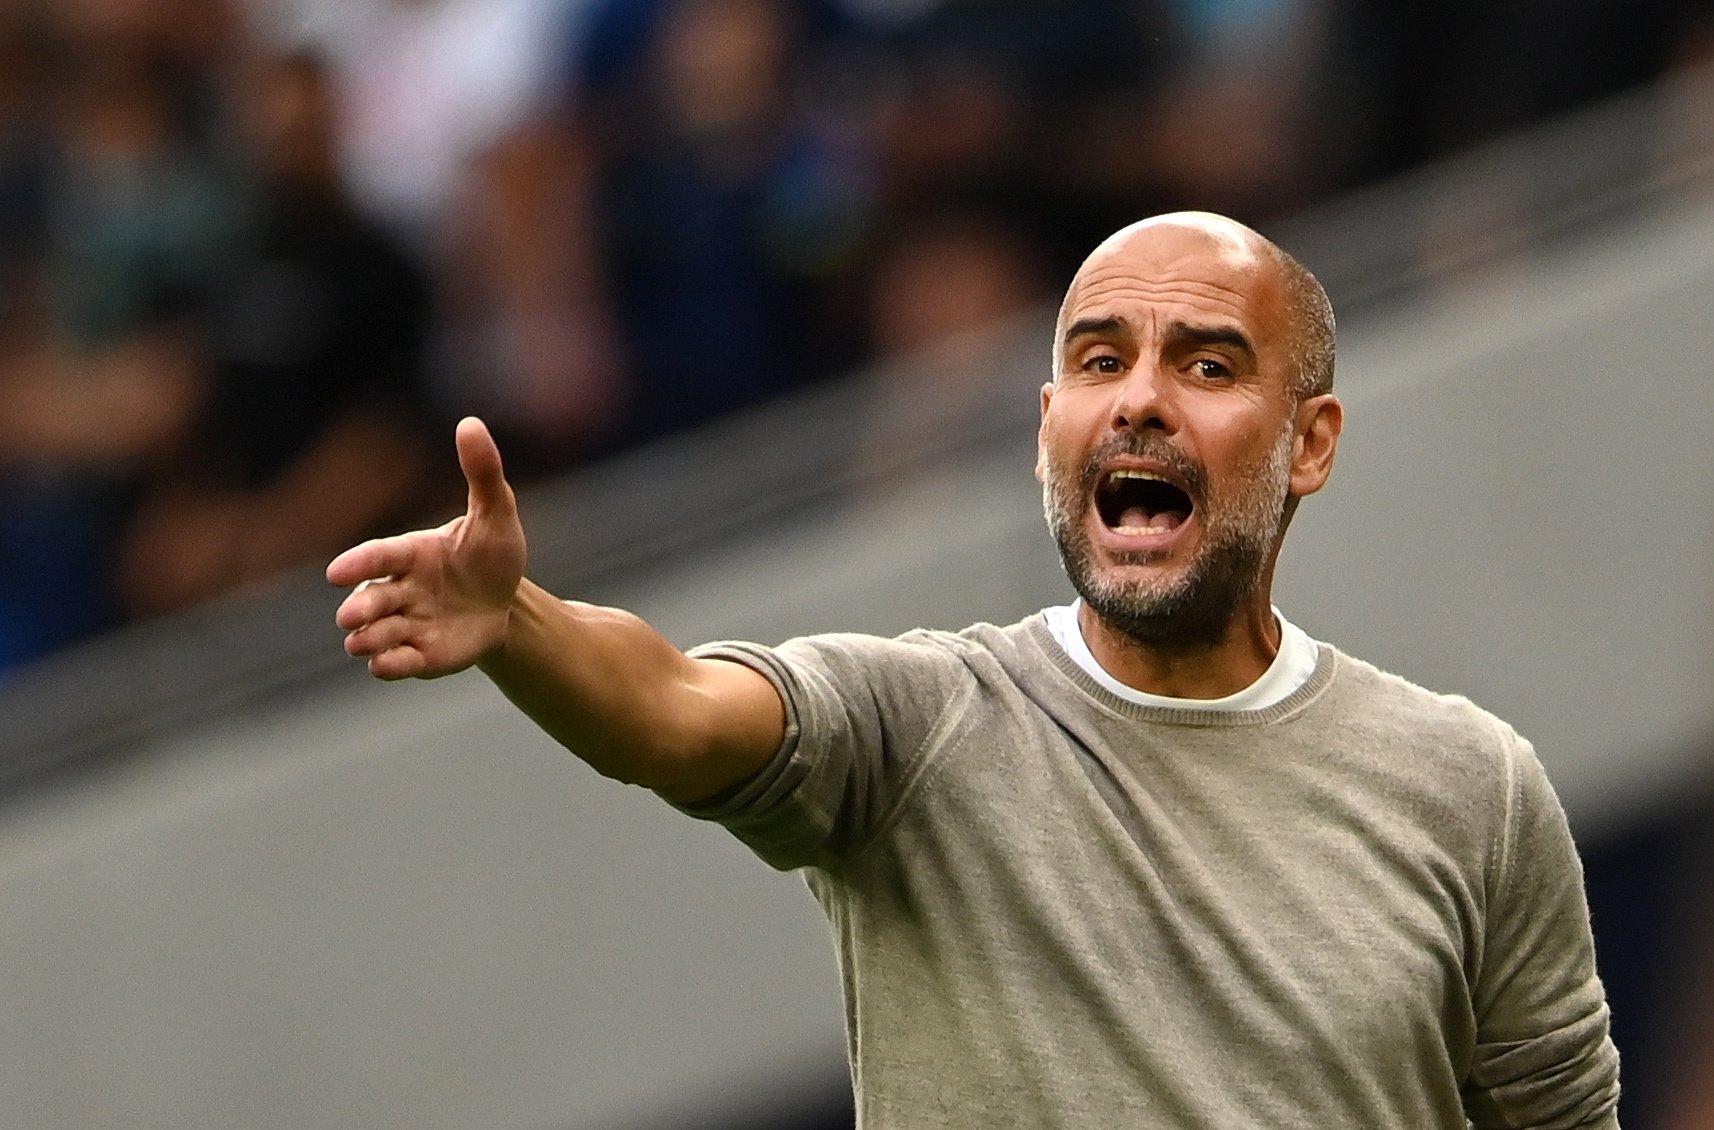 Man City manager Pep Guardiola reacts during his team's 0-1 loss to Tottenham at the Tottenham Hotspur Stadium, London, Britain, Aug. 15, 2021. (EPA Photo)